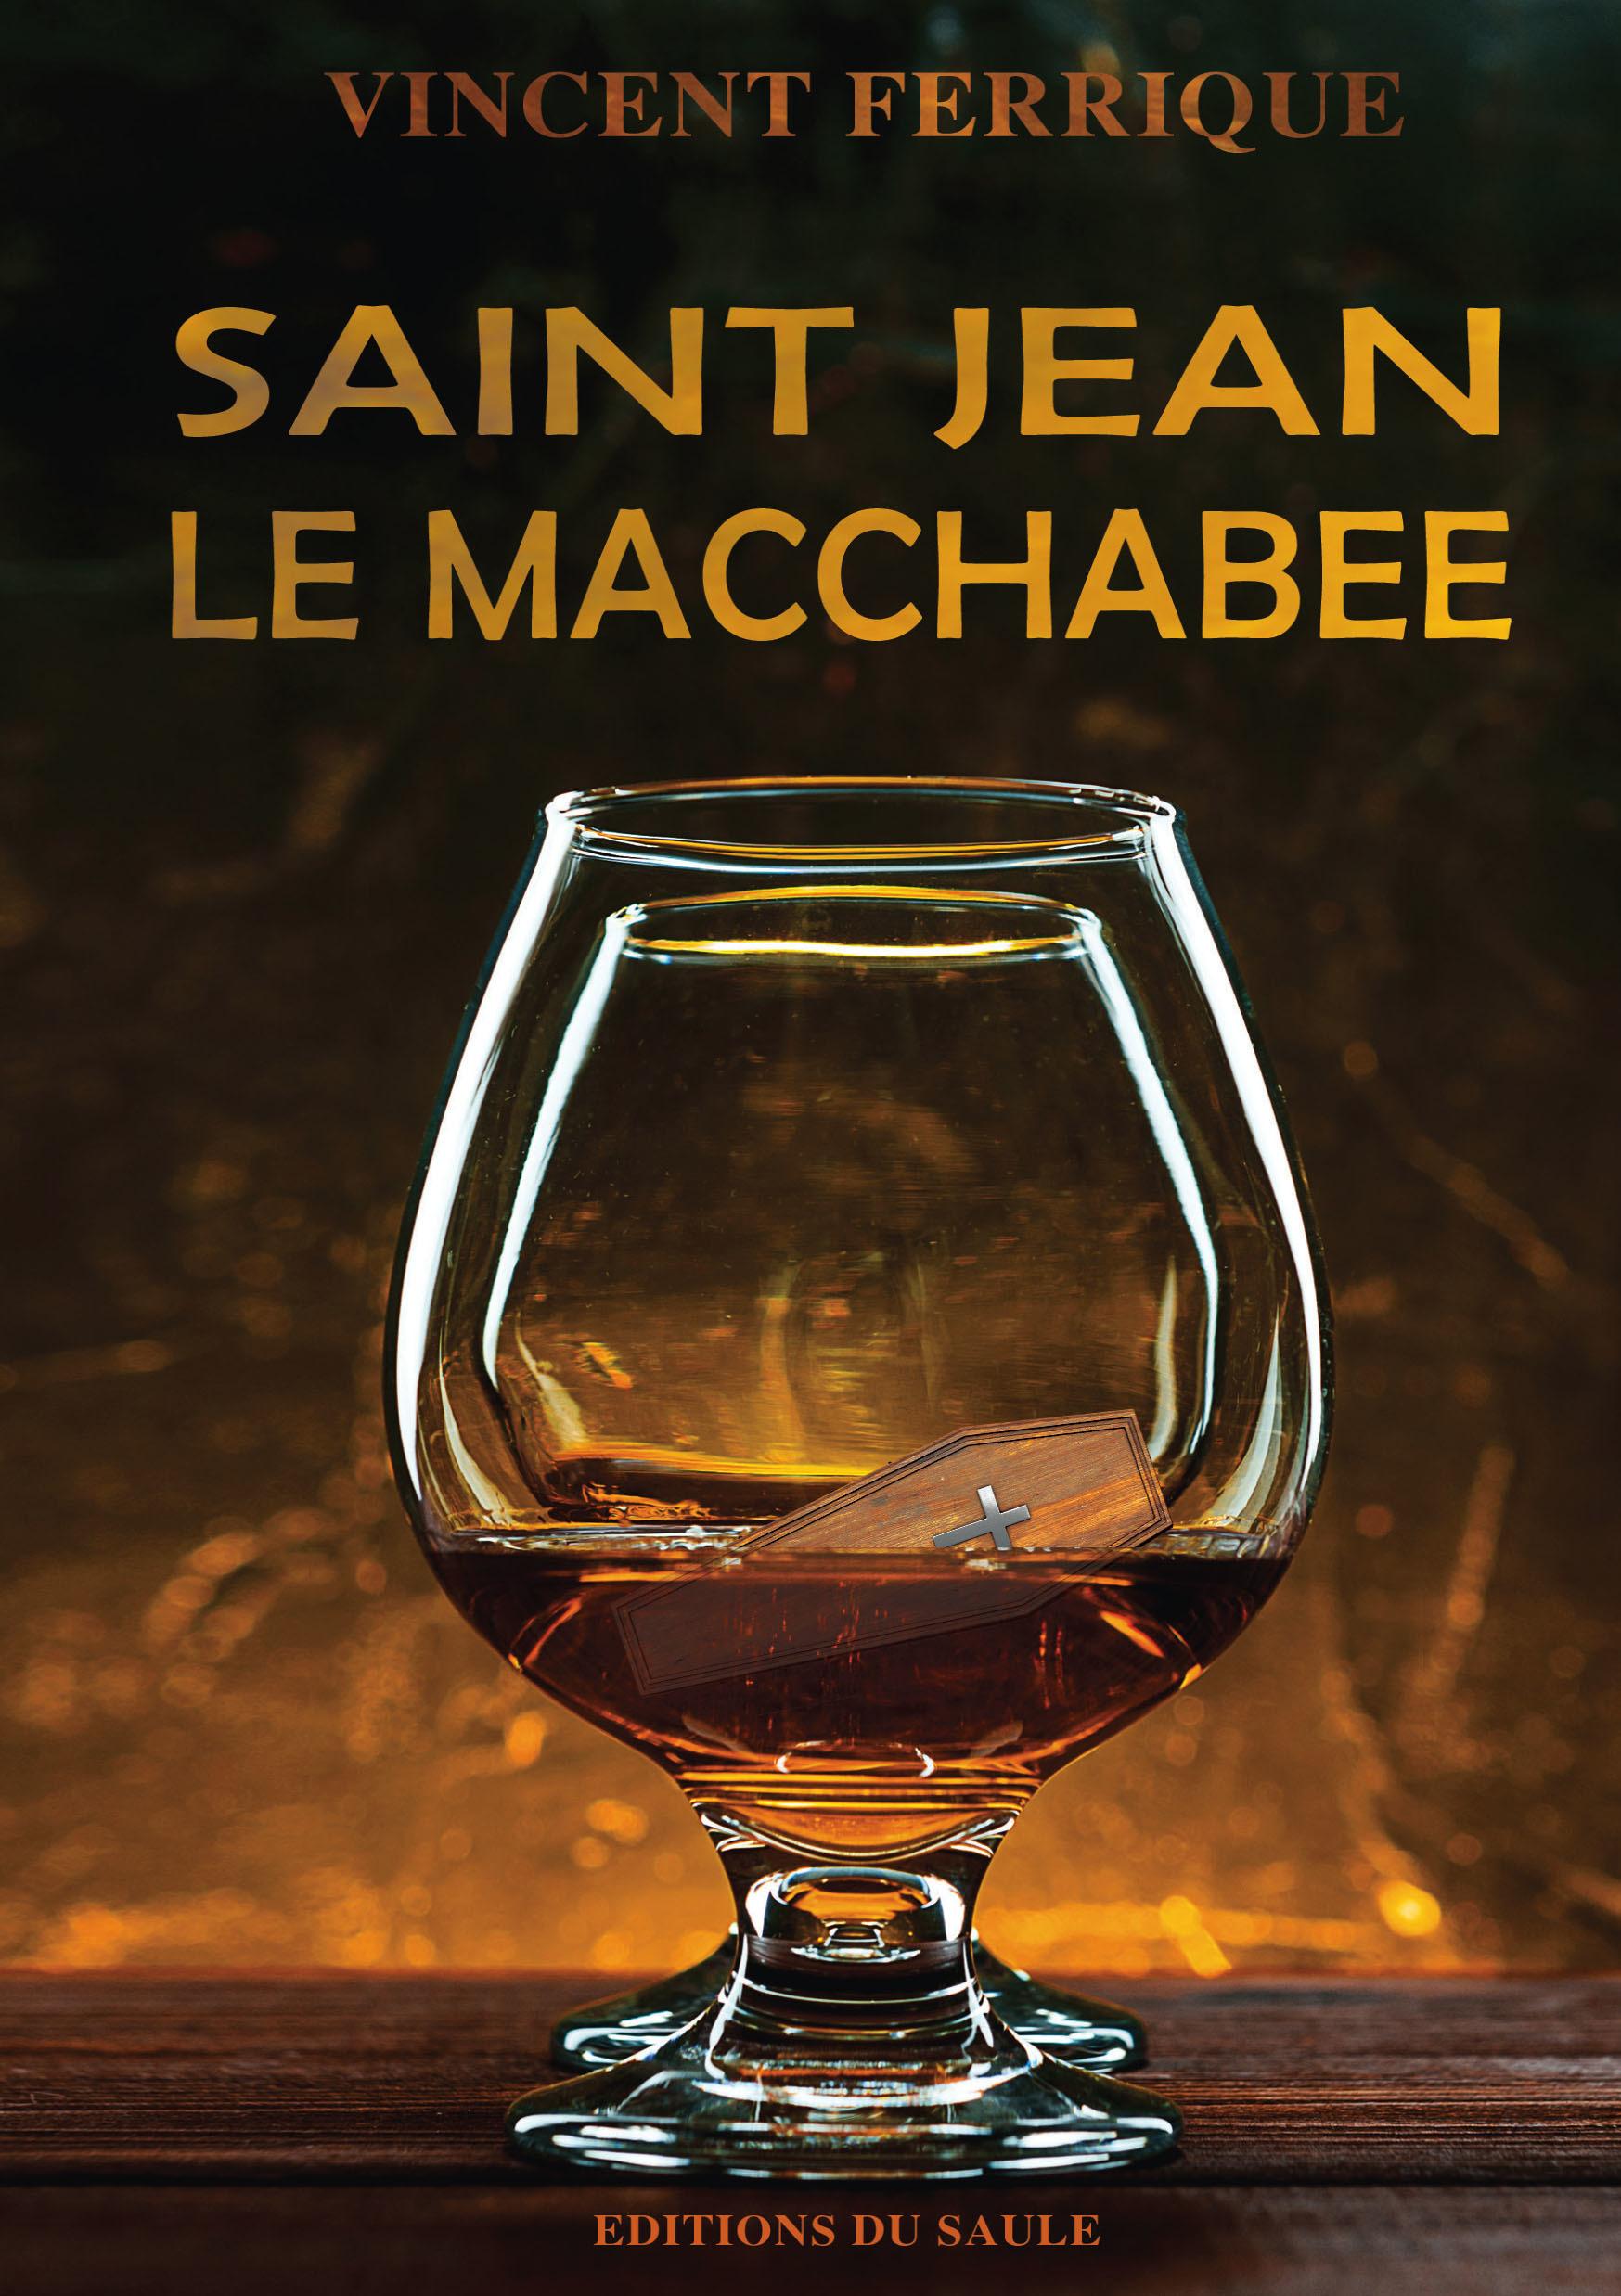 Saint jean le macchabee